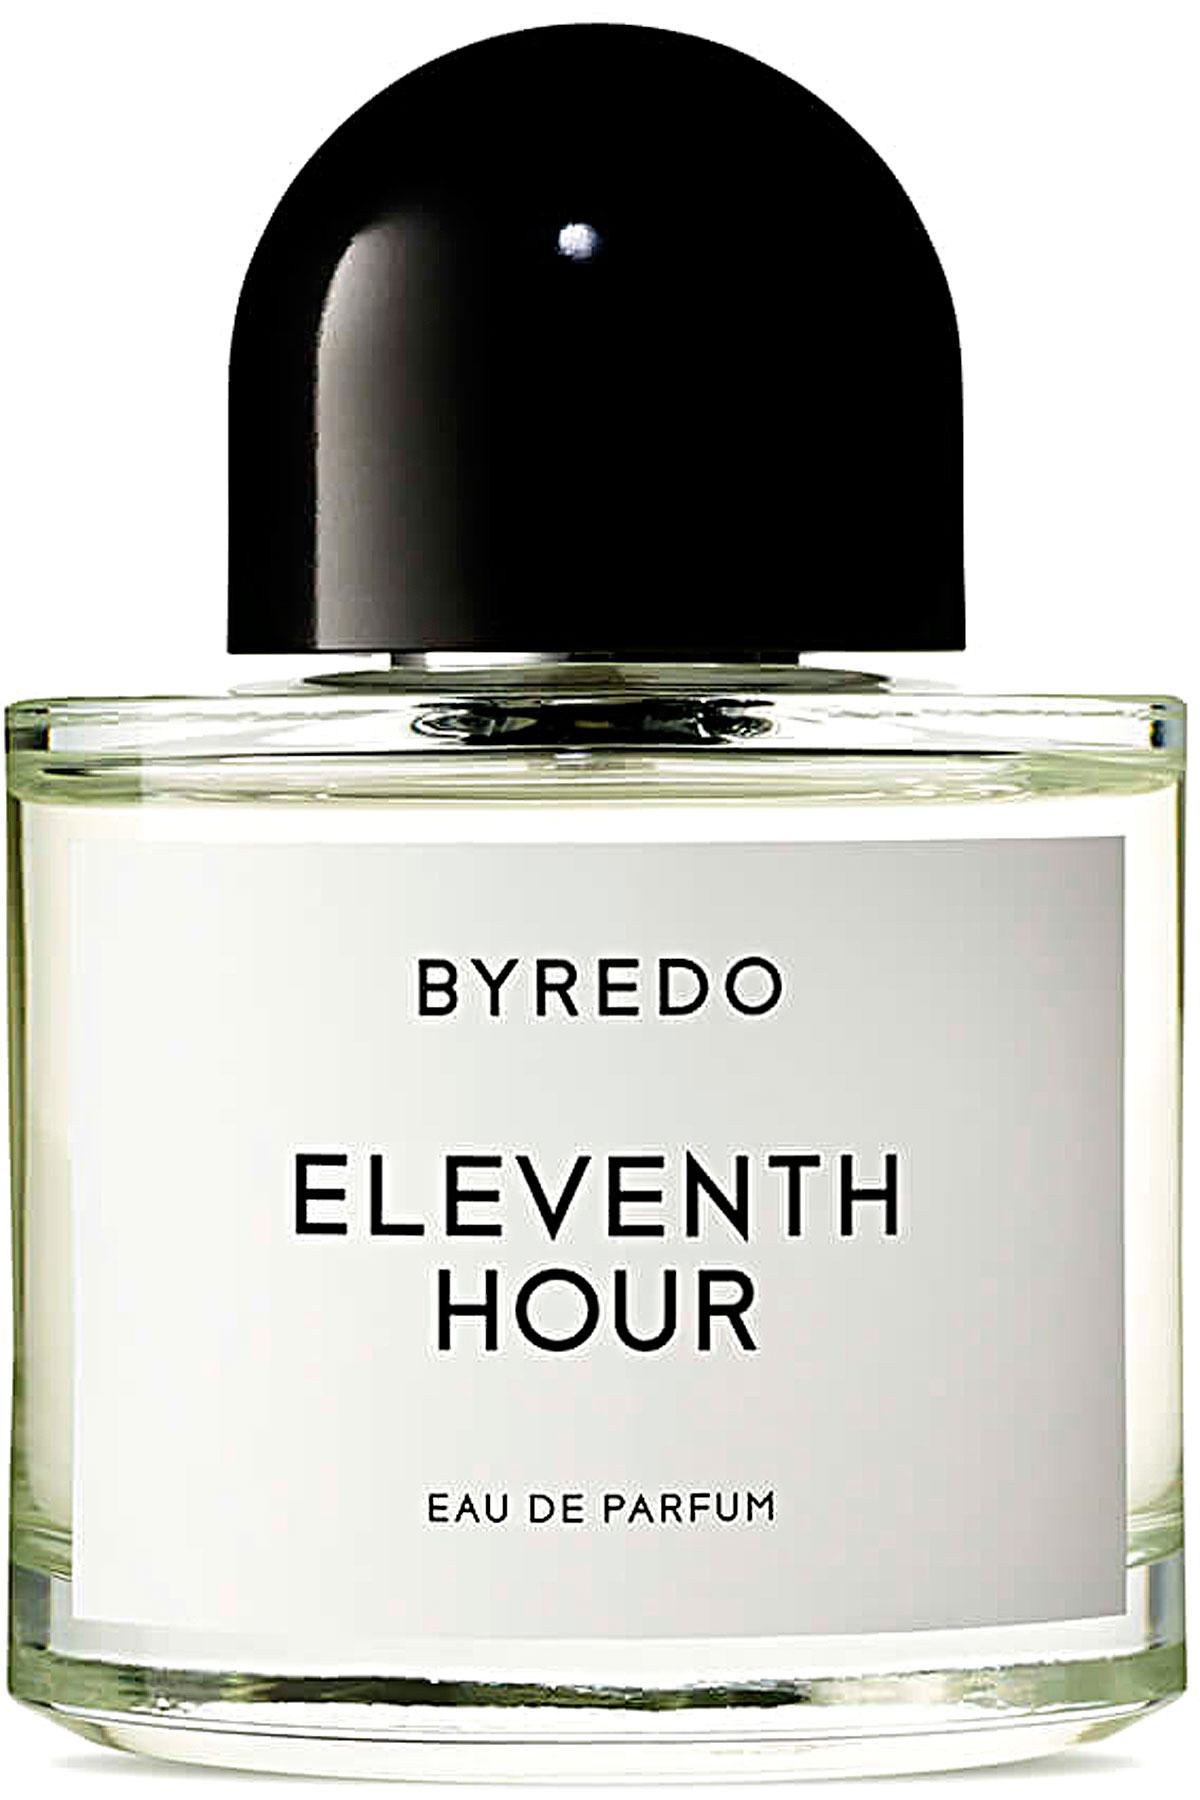 Byredo Fragrances for Women On Sale, Eleventh Hour - Eau De Parfum - 100 Ml, 2019, 100 ml